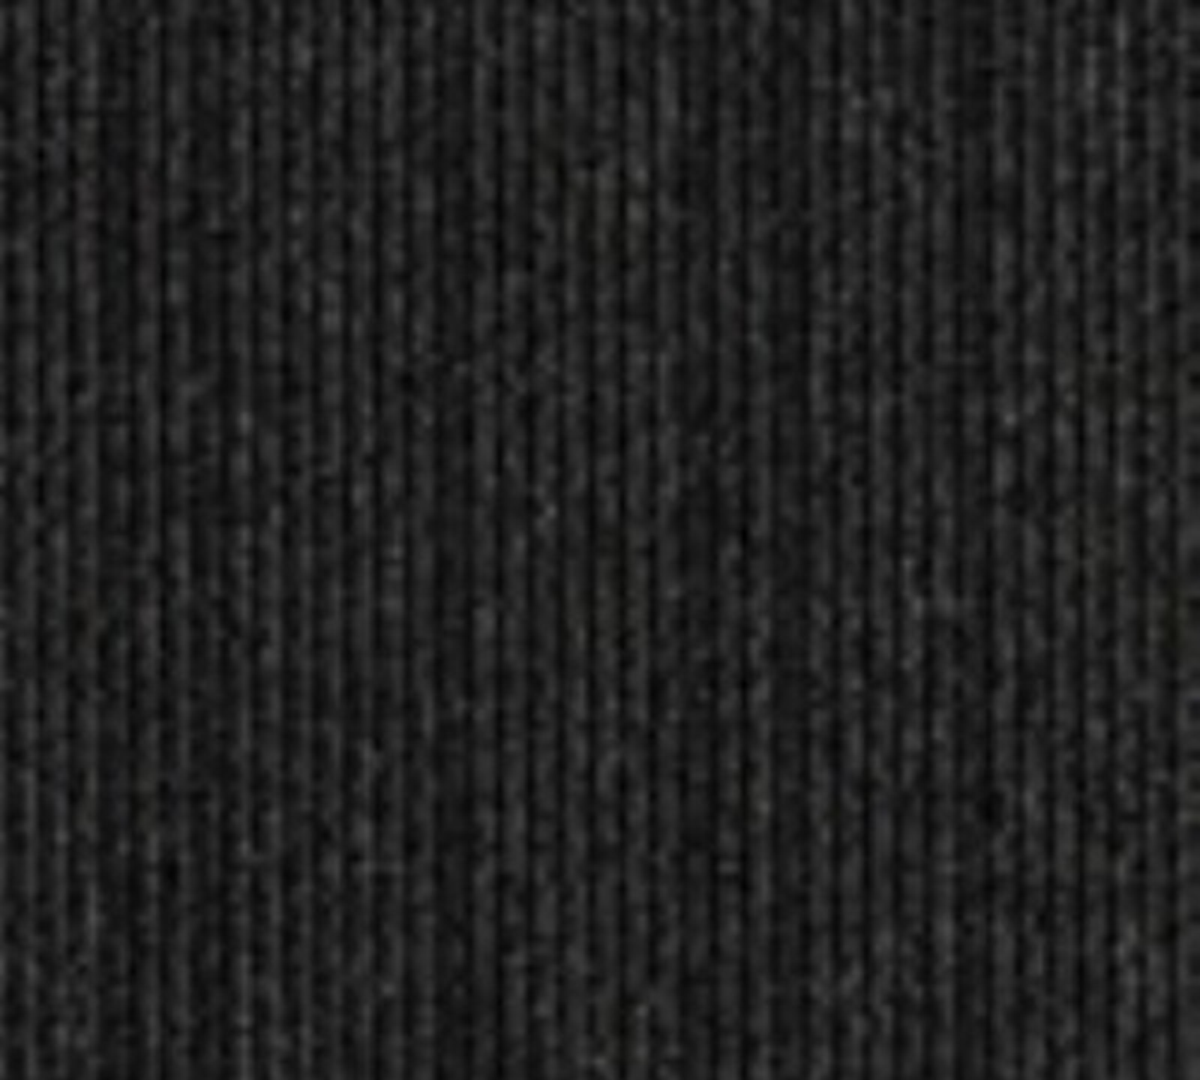 Ковровая плитка DESSO AirMaster 9511 (500*500*6 мм)